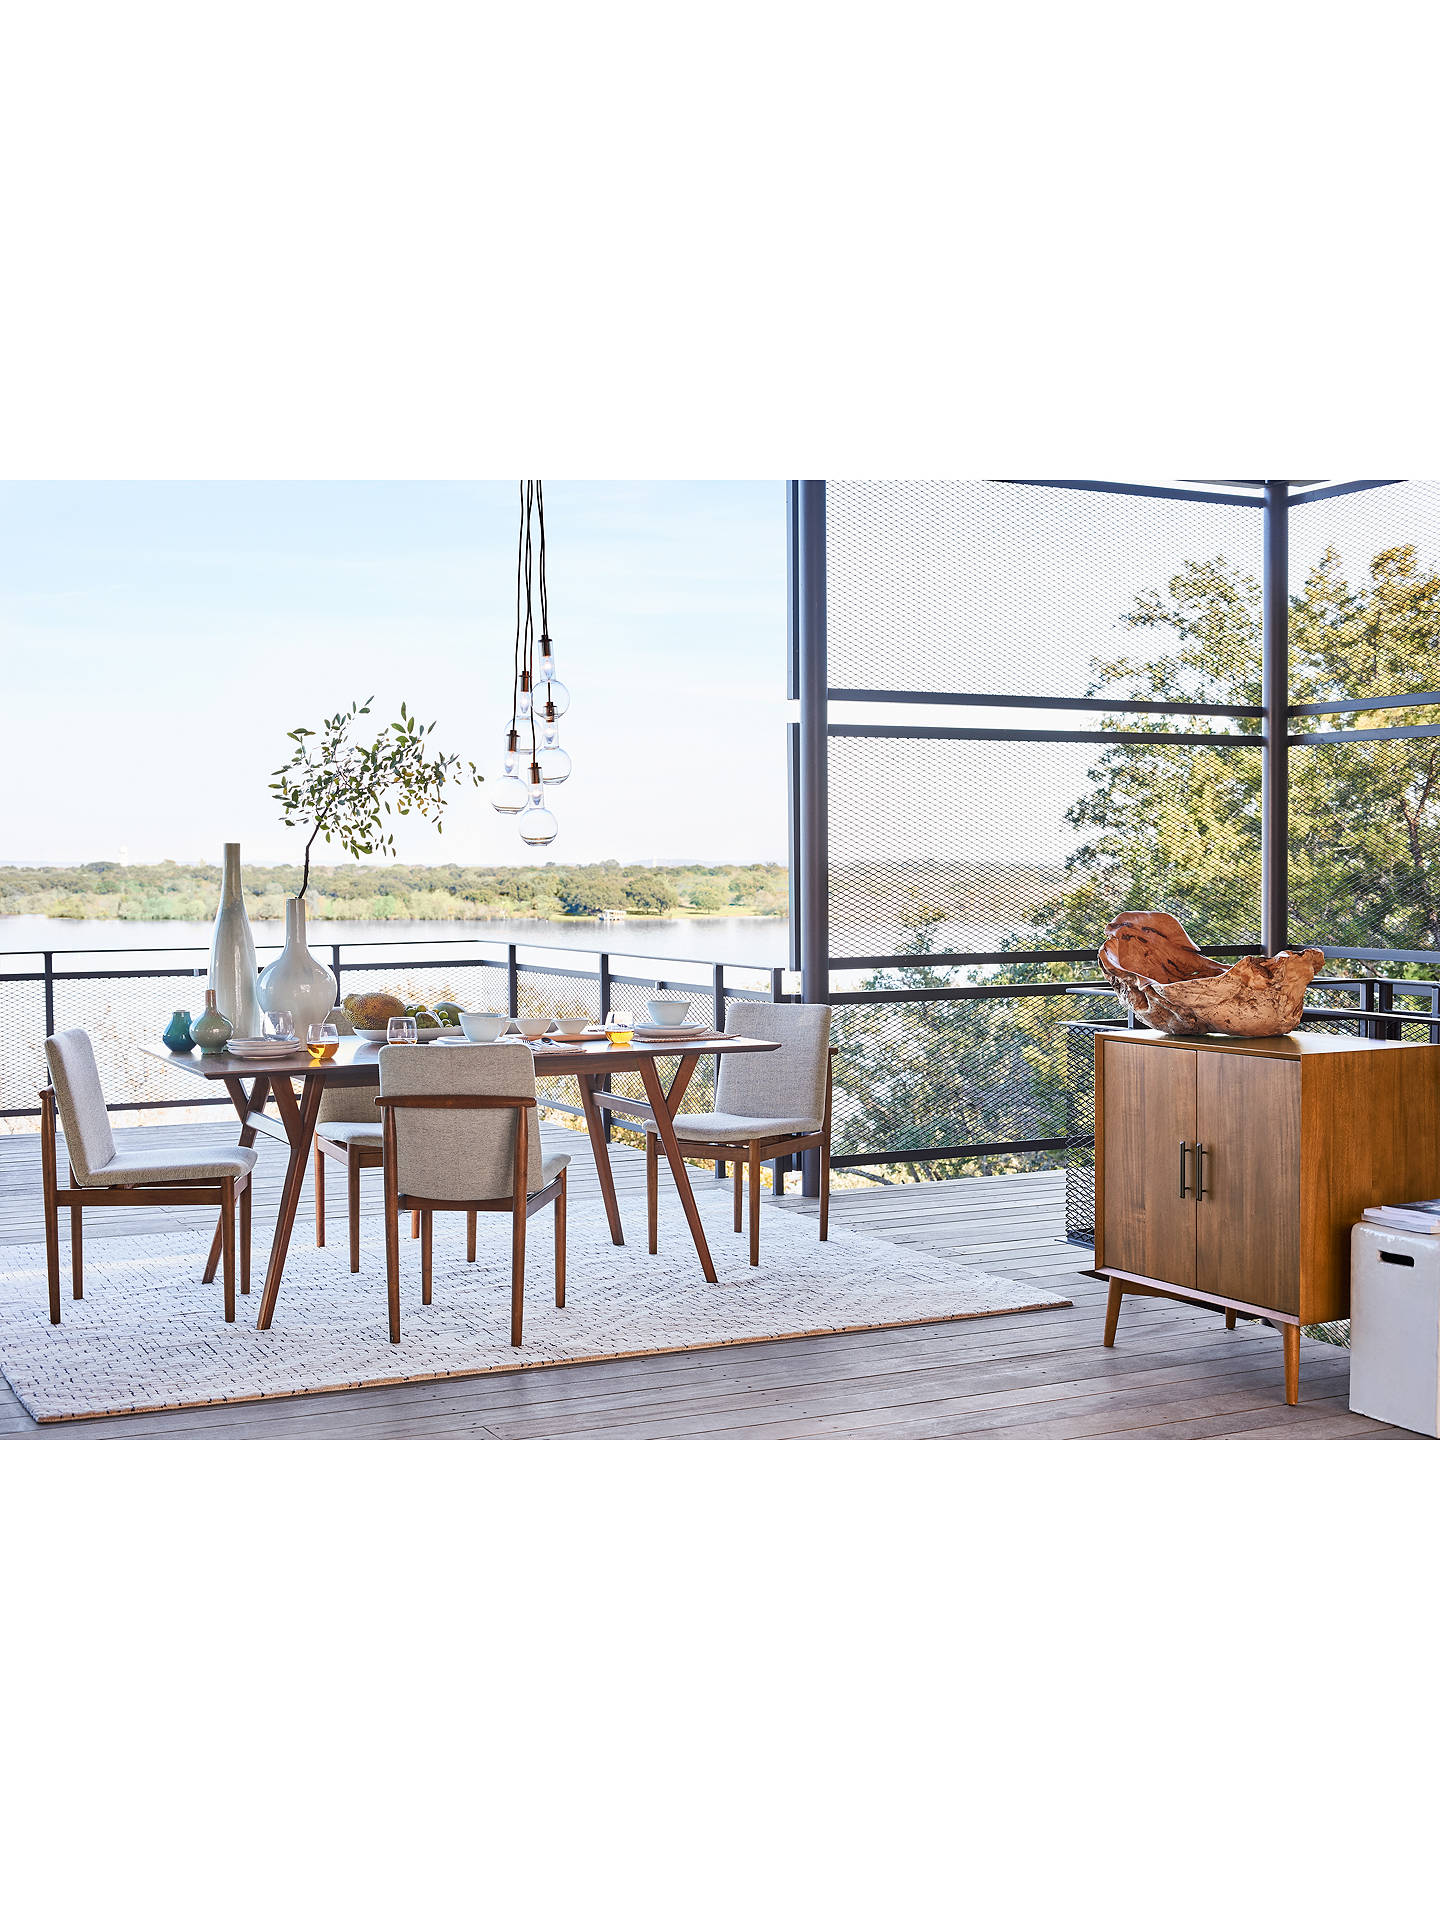 Sensational West Elm Framework Dining Chair Twill Walnut Short Links Chair Design For Home Short Linksinfo